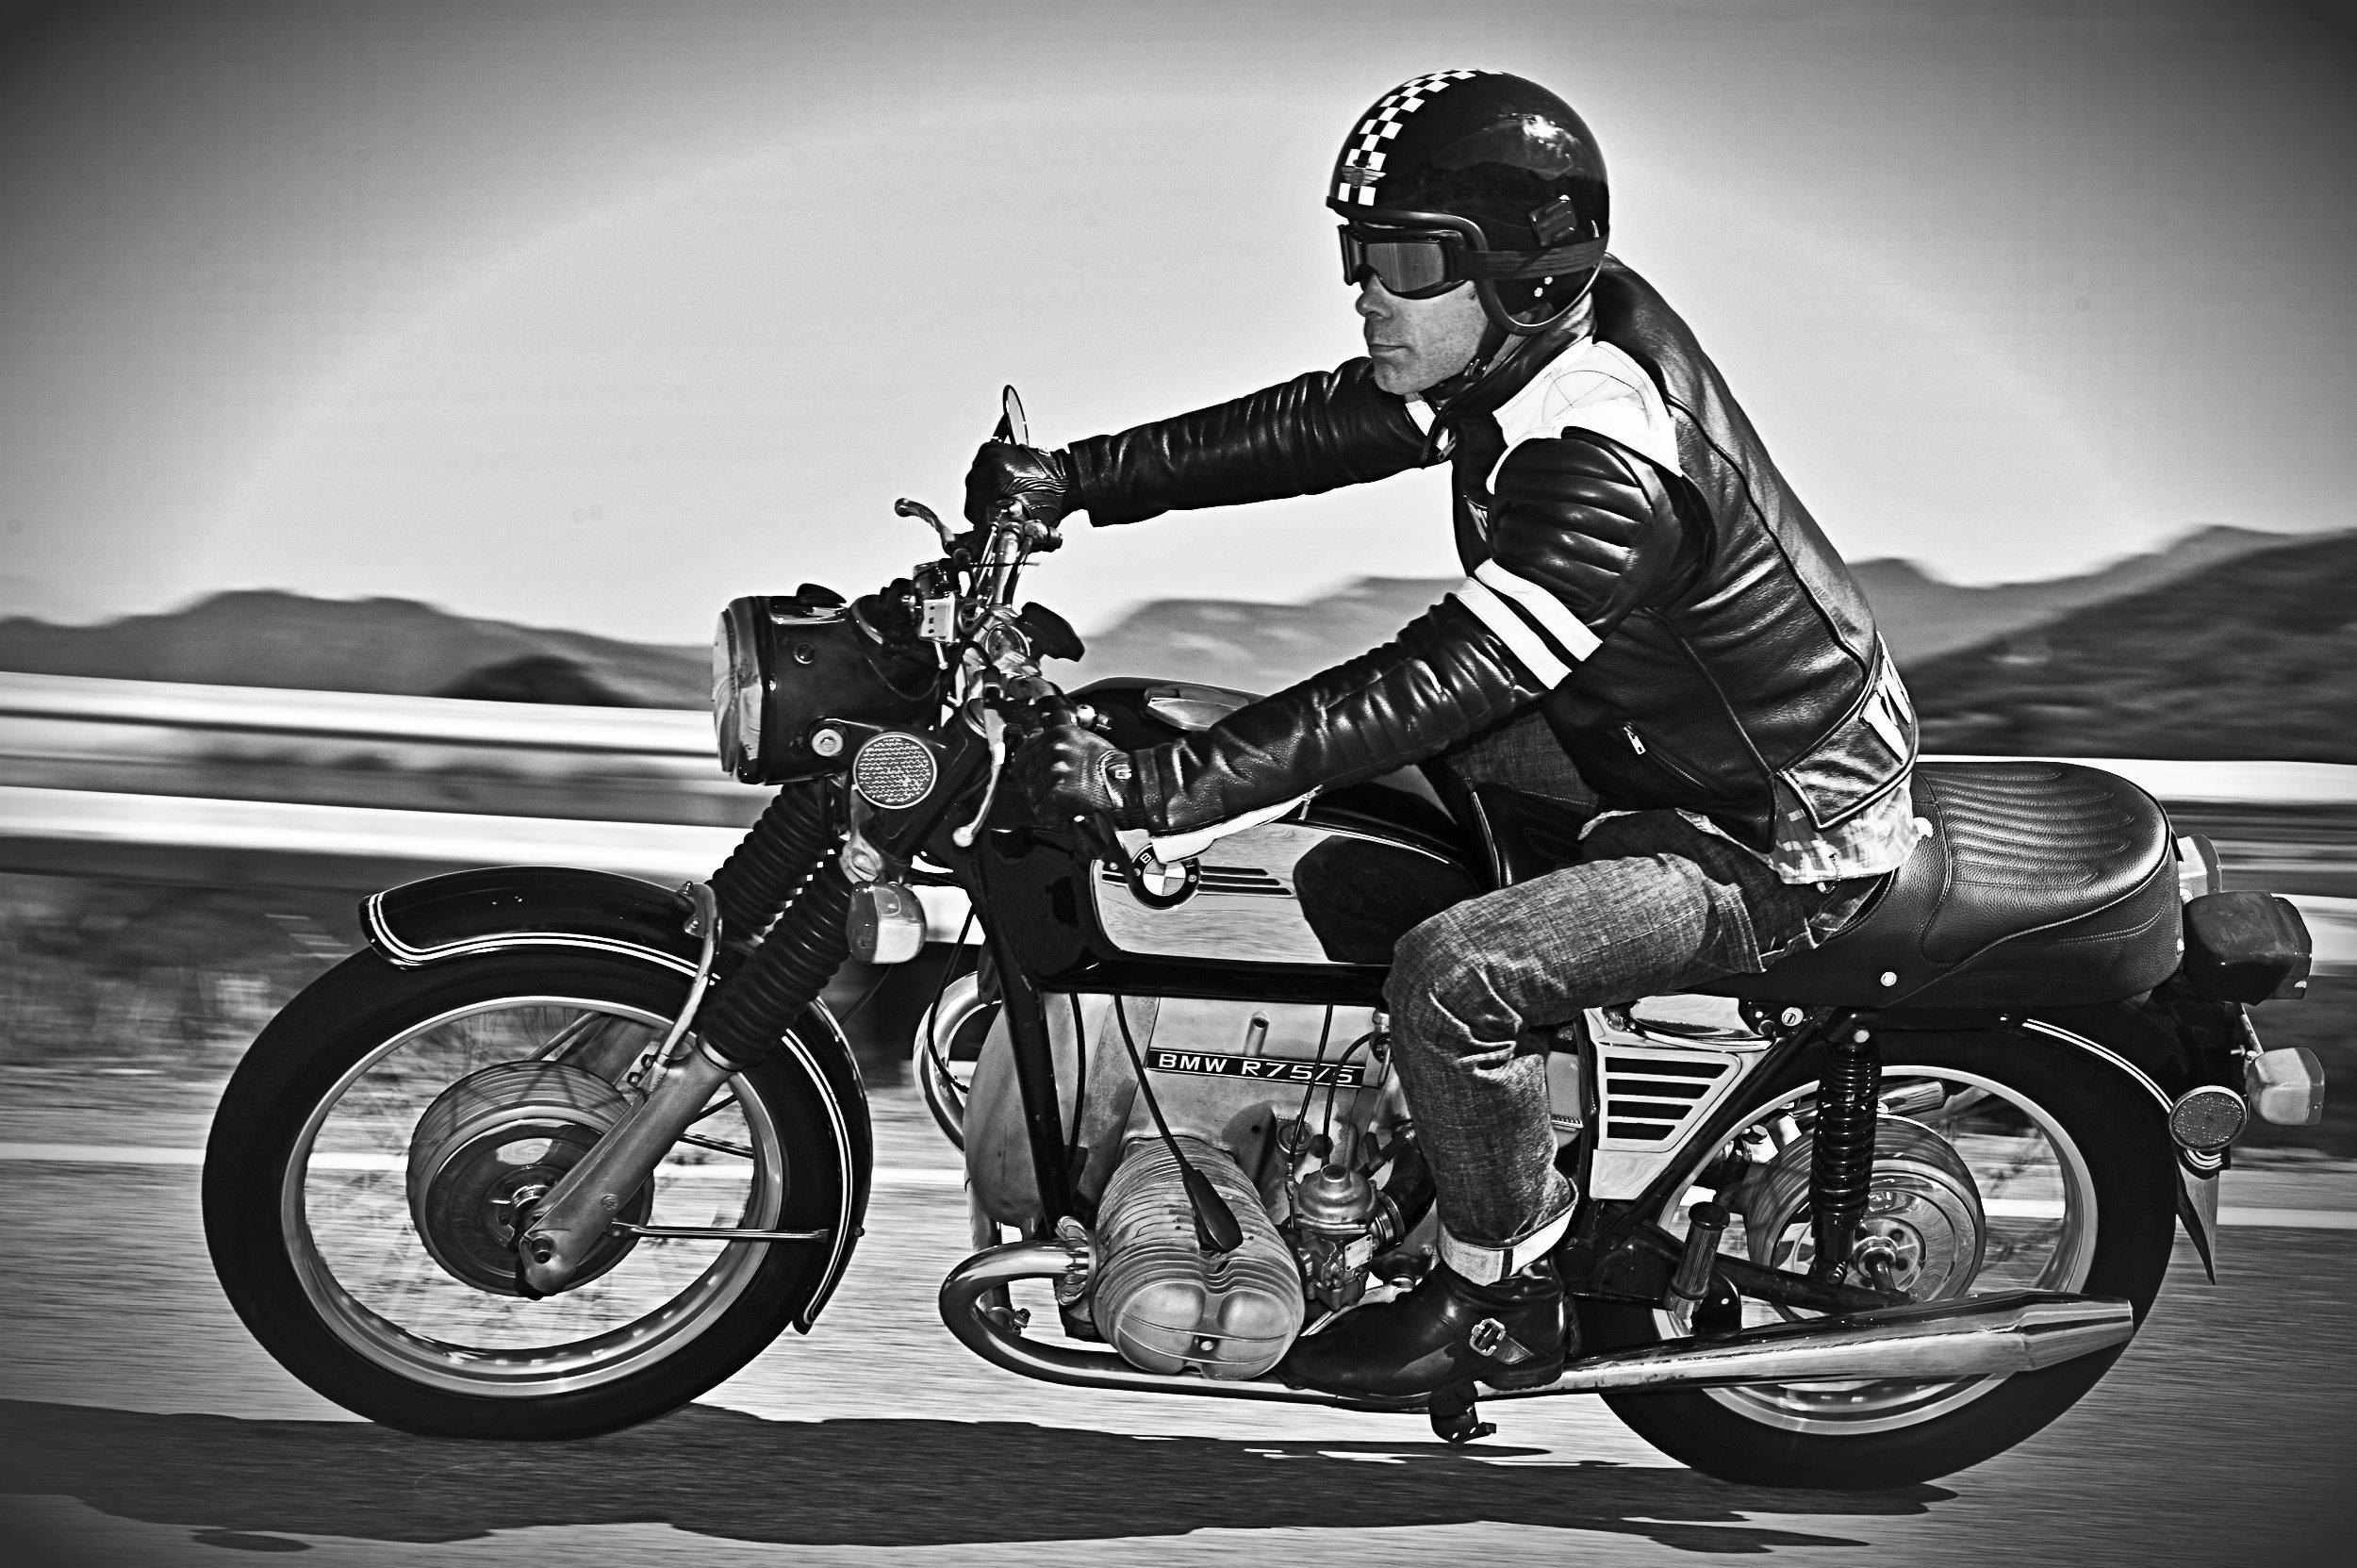 bmw vintage retro motorbike motorcycle bike classic wallpaper 2500x1663 712026 wallpaperup. Black Bedroom Furniture Sets. Home Design Ideas